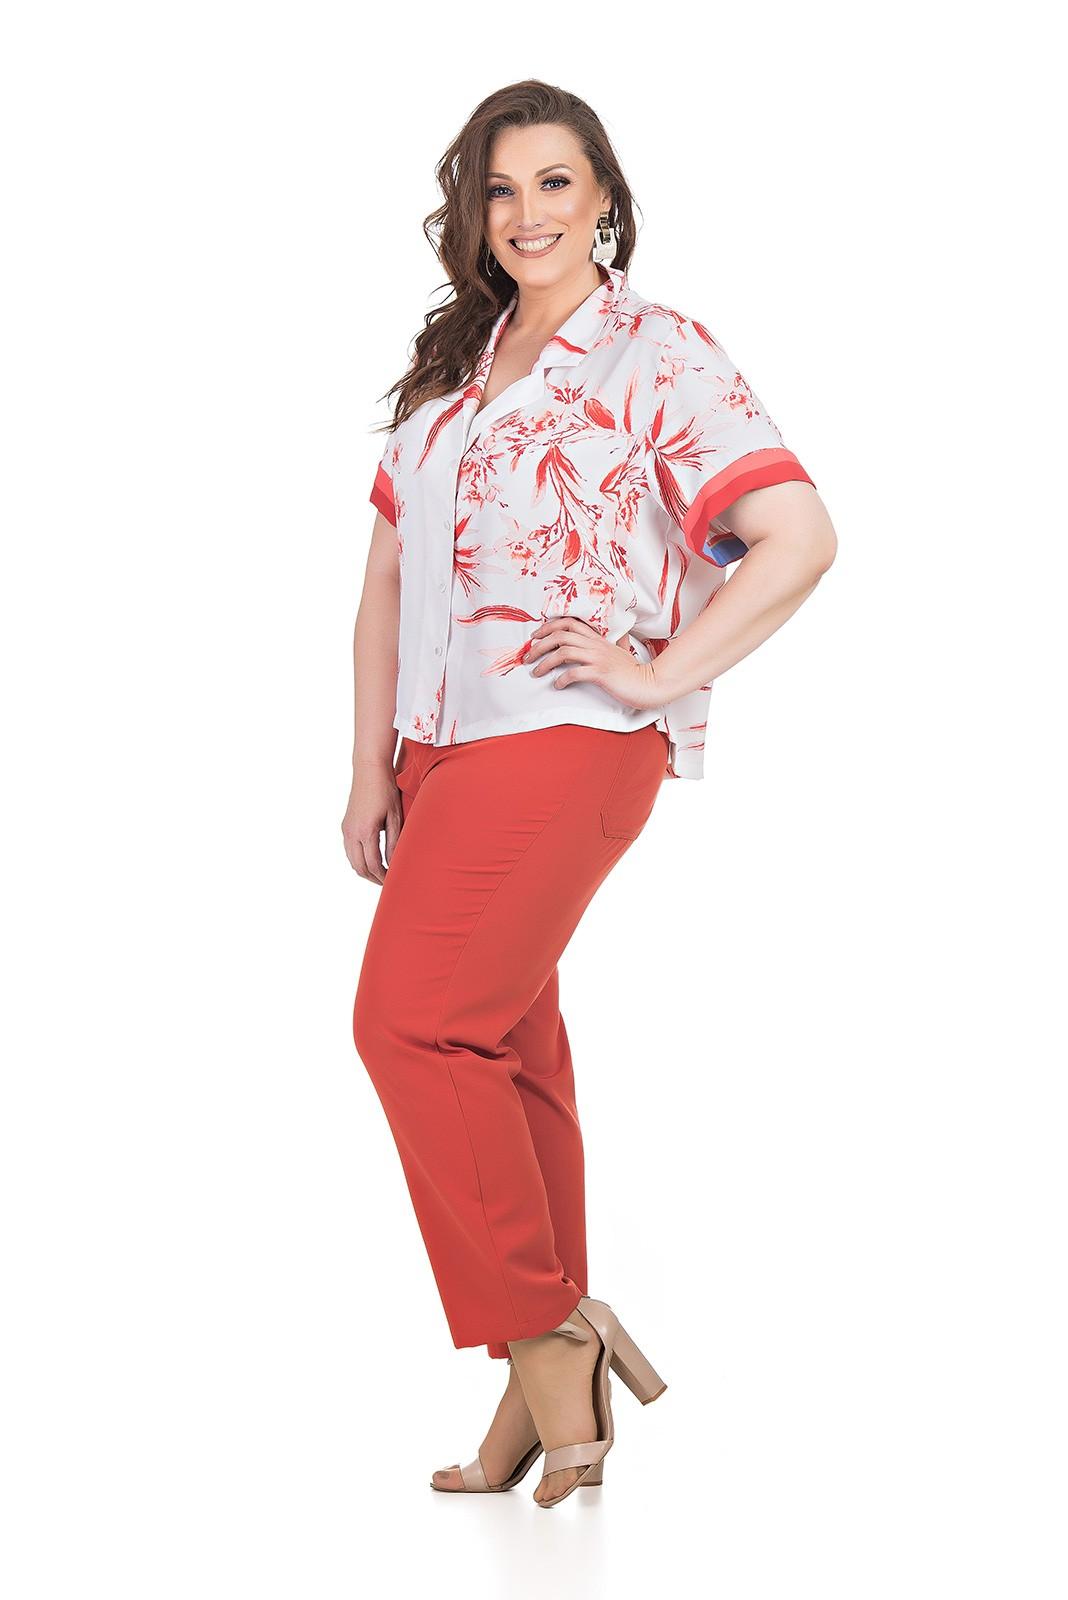 Camisa Curta em Tecido Fluido Plus Size